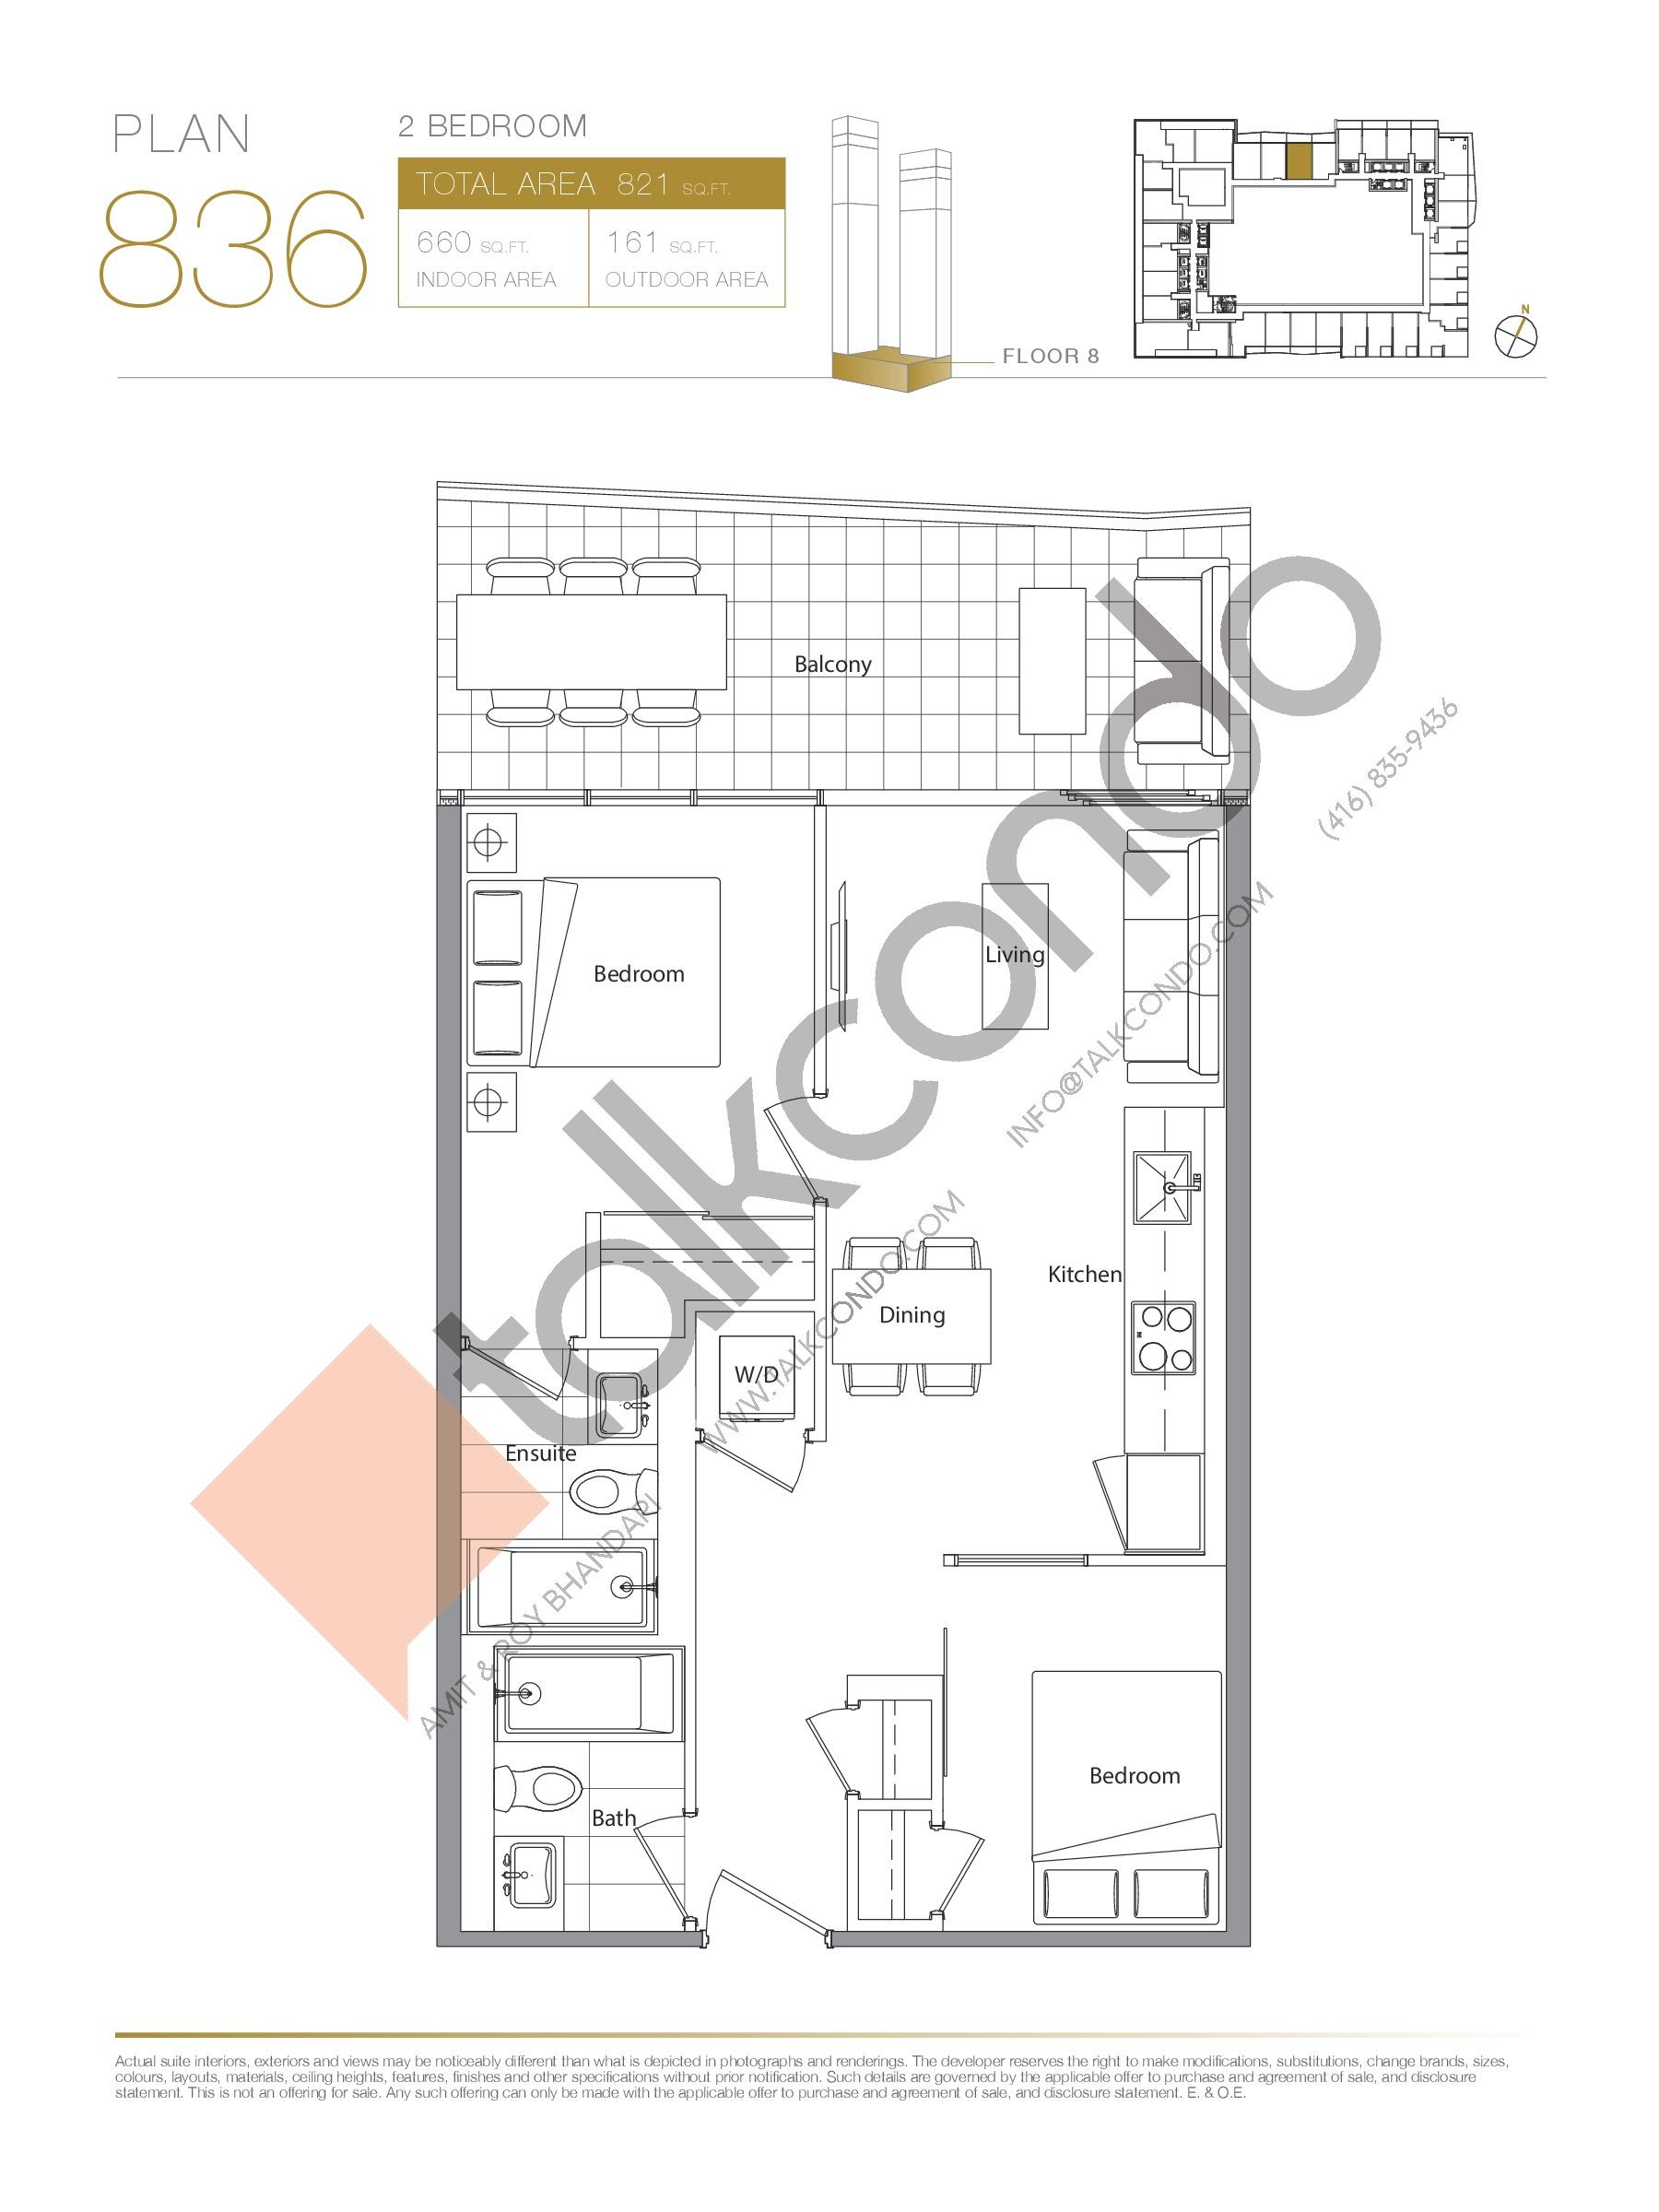 Plan 836 Floor Plan at Concord Canada House Condos - 660 sq.ft